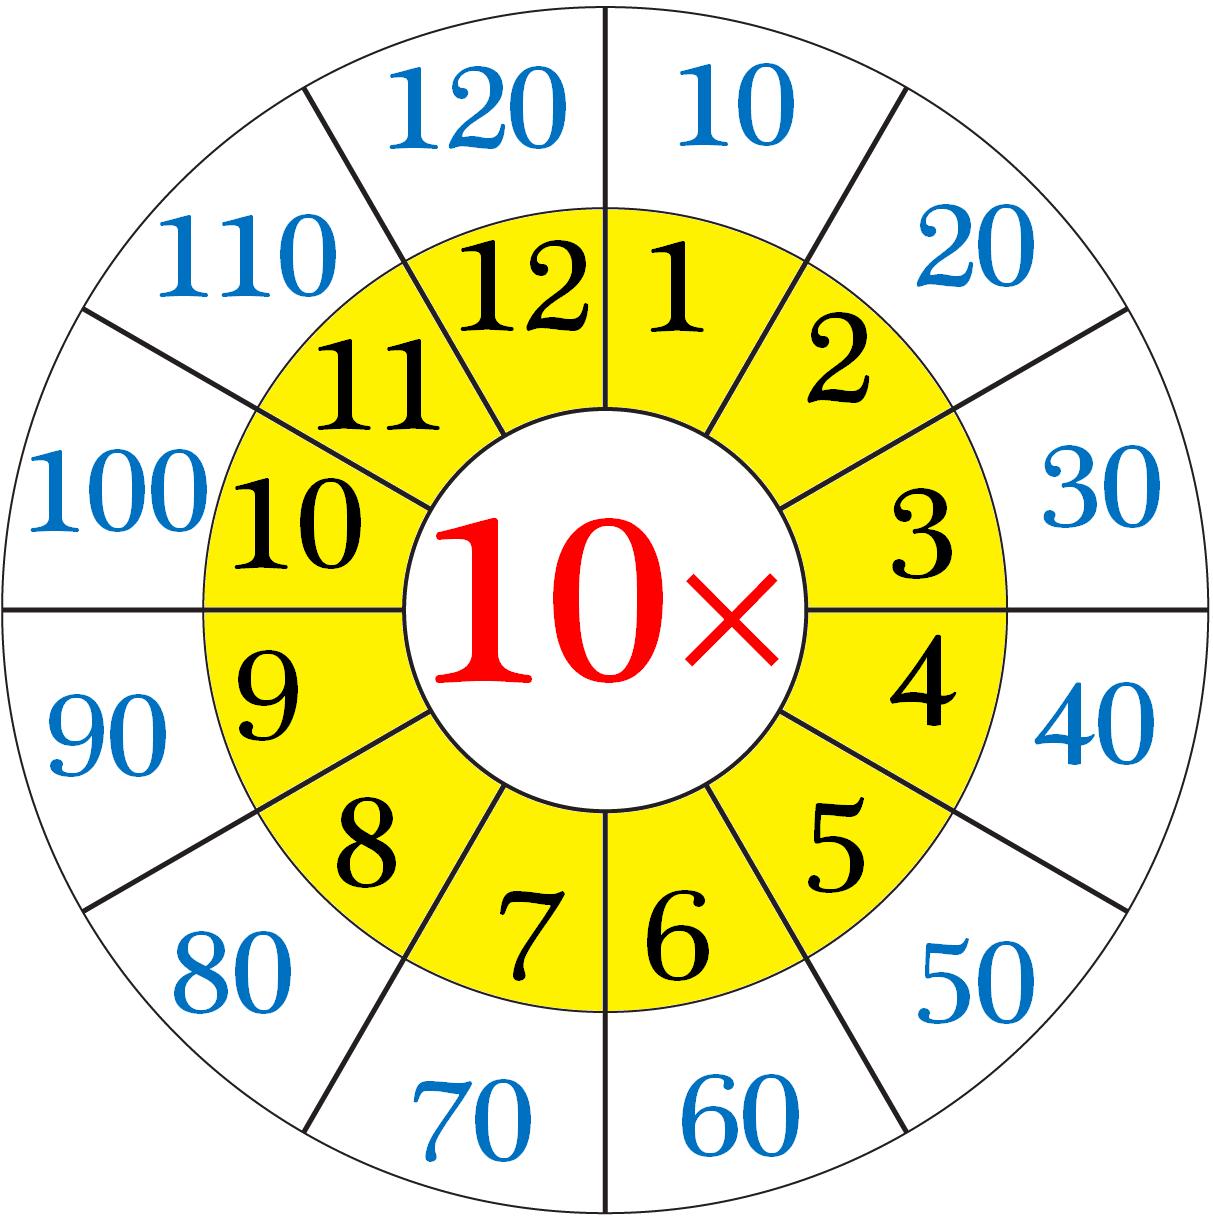 Multiplication Table of Ten